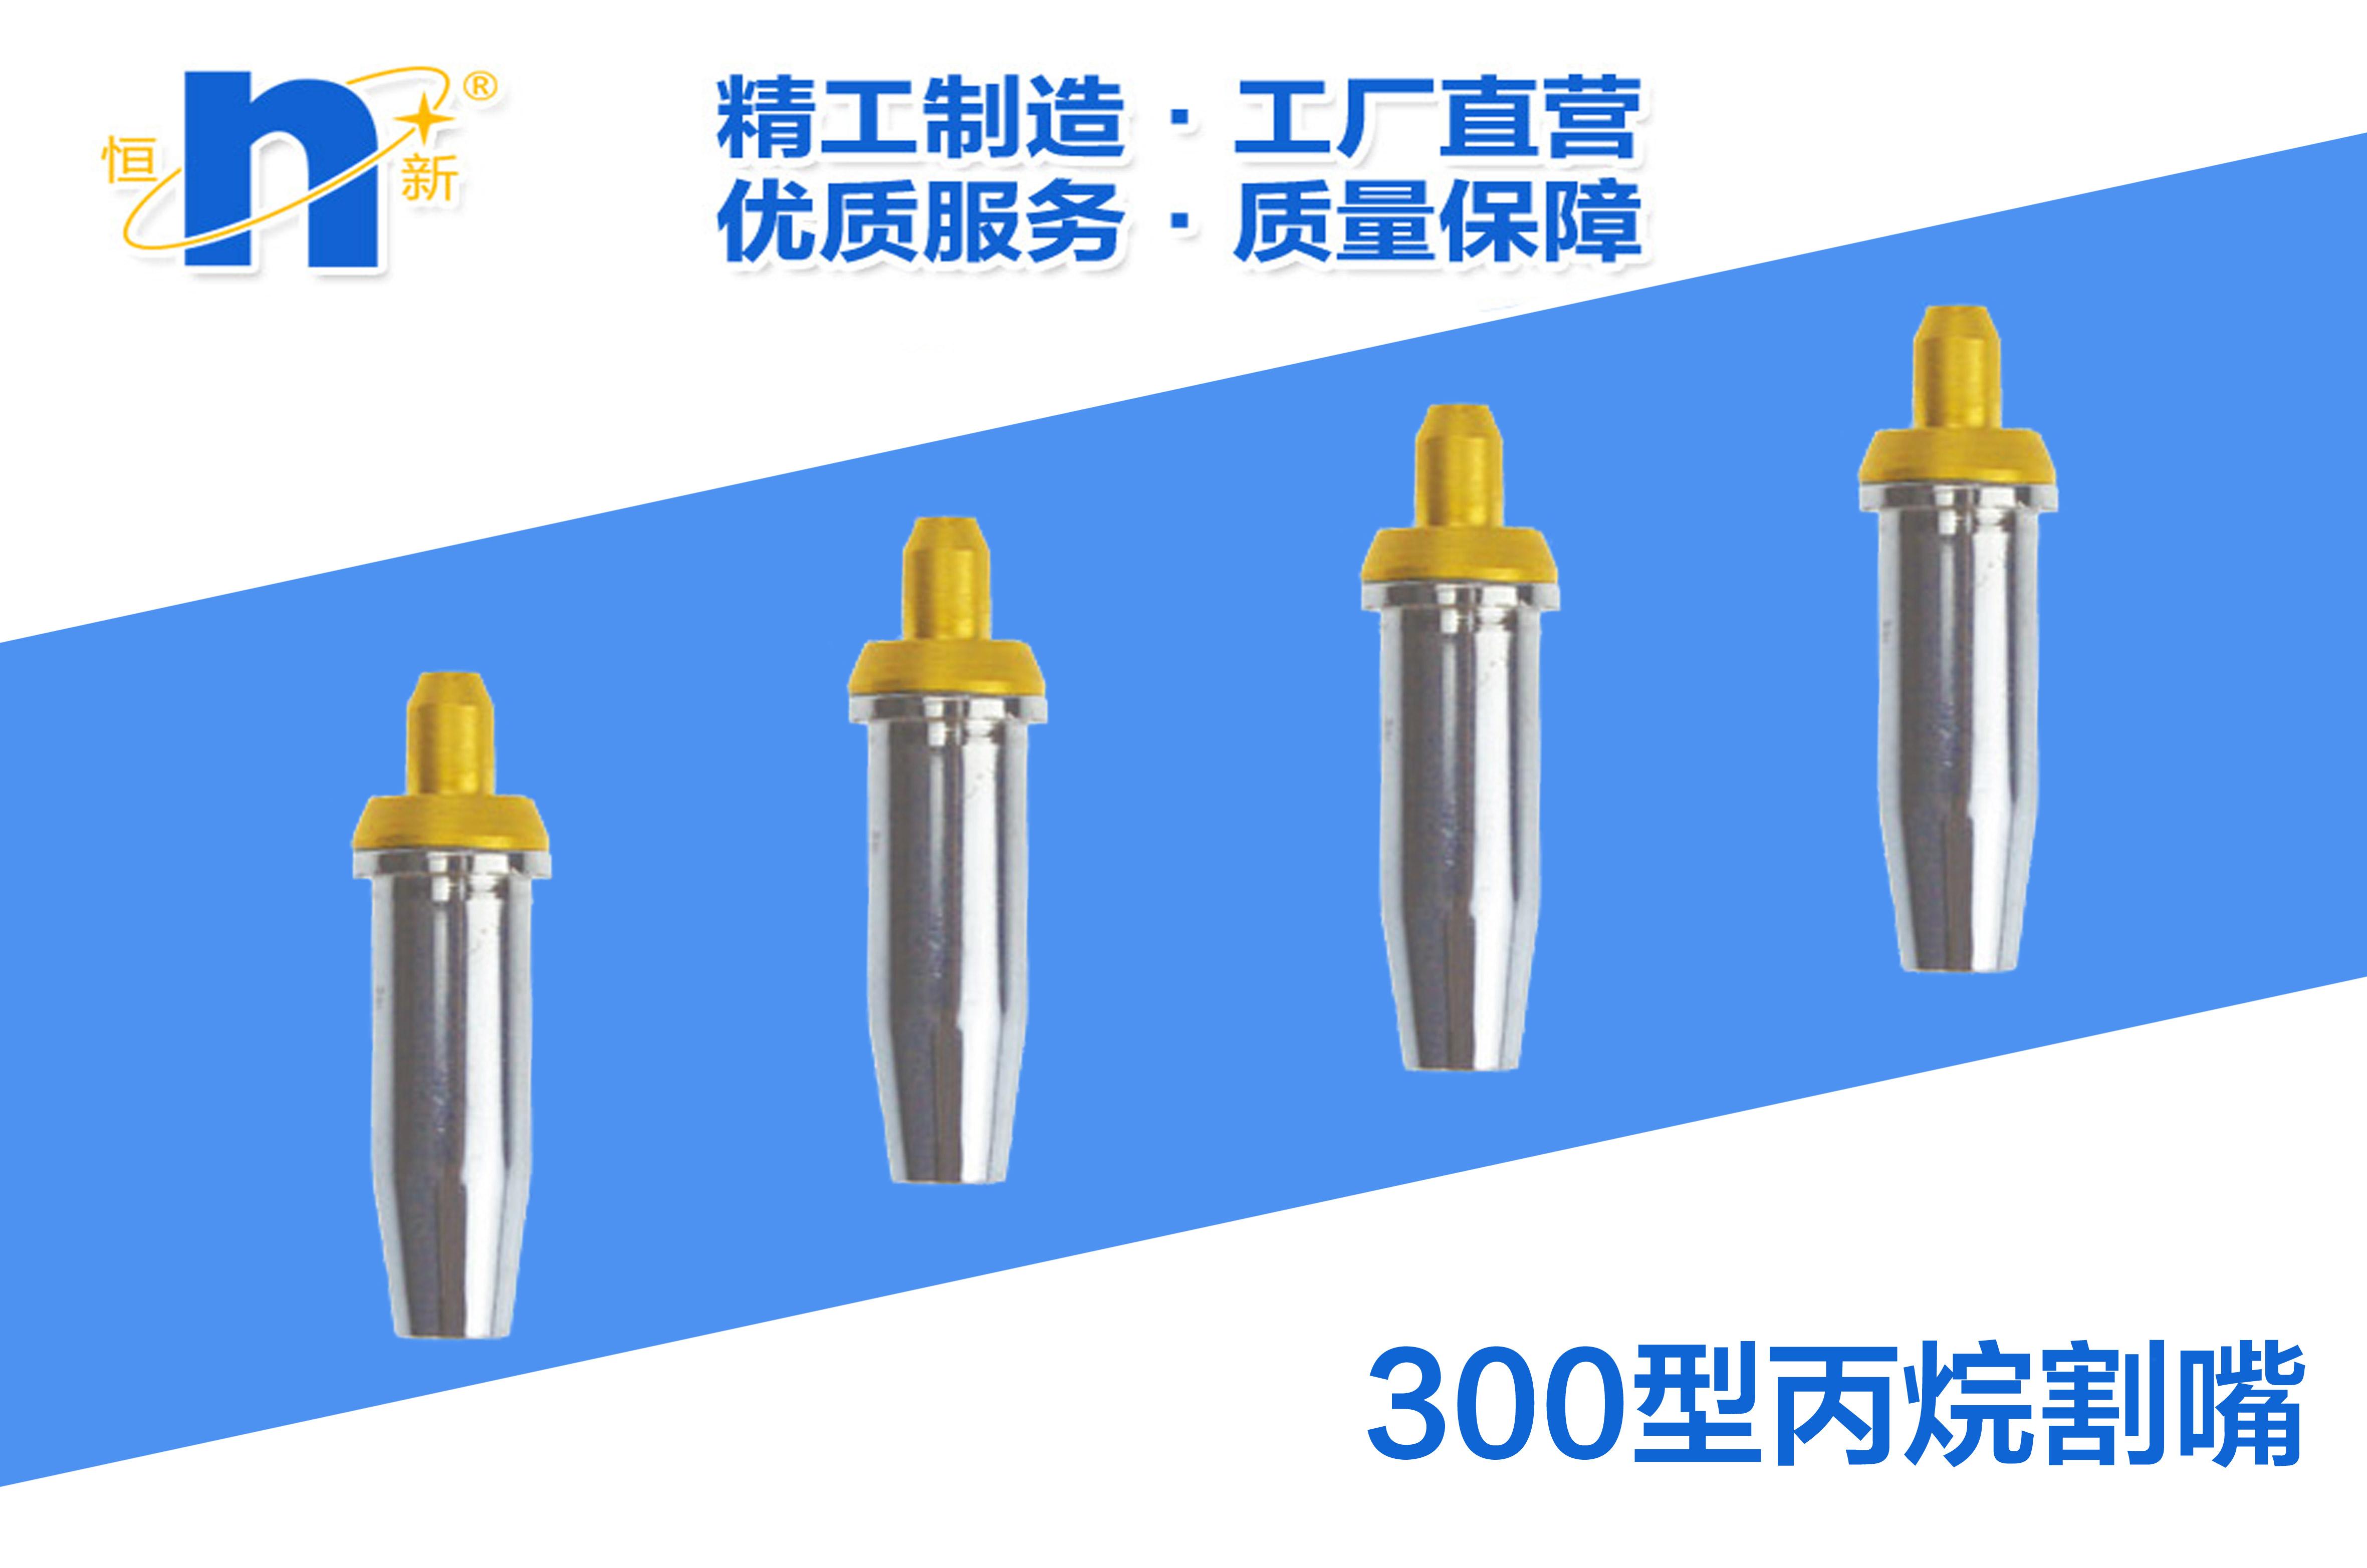 G07-300型丙烷割嘴 恒新